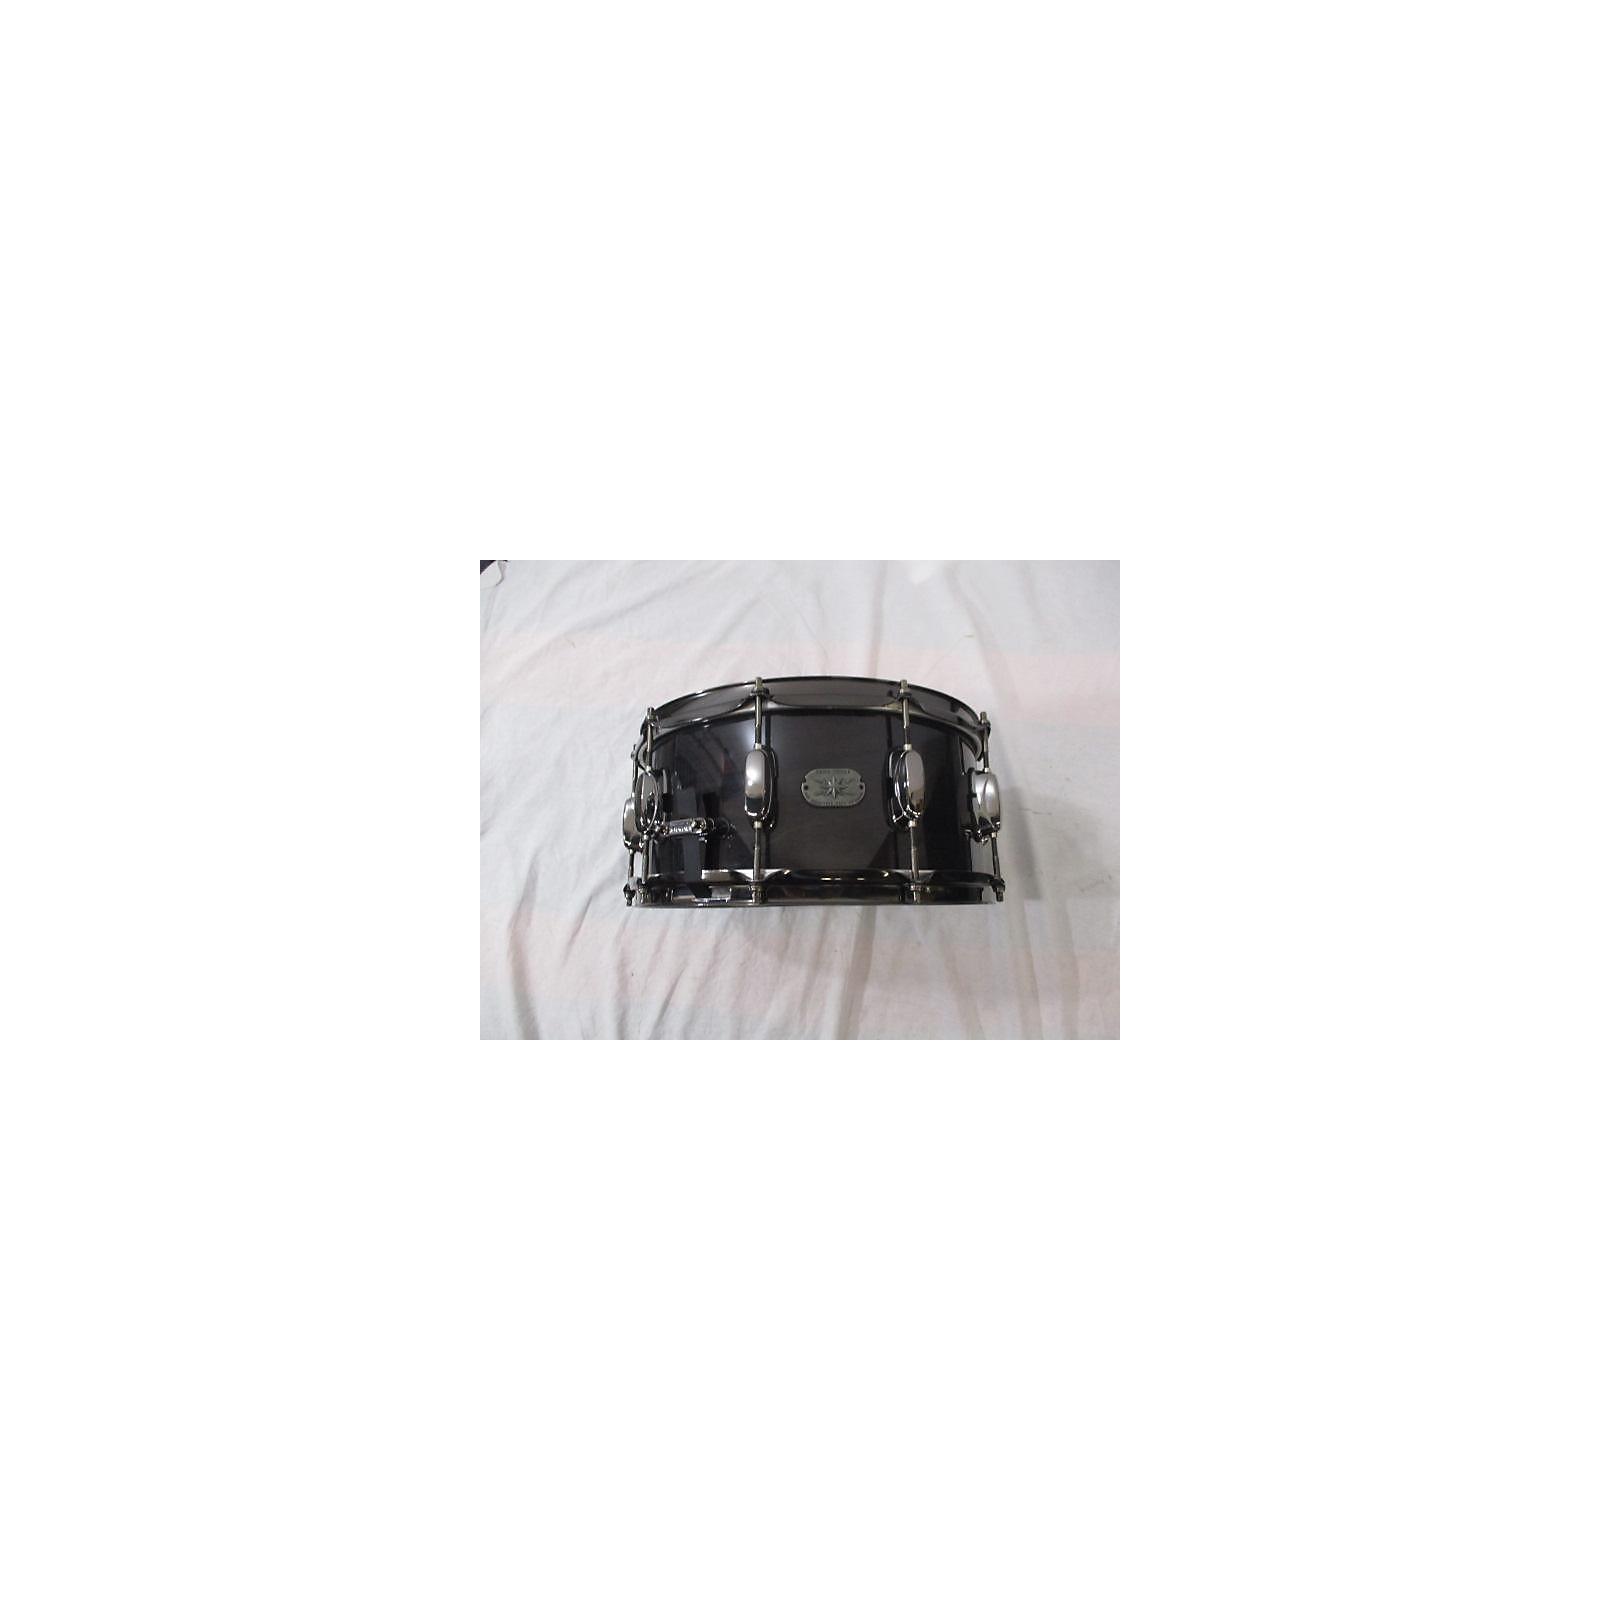 TAMA 14X6 Artwood Snare Drum